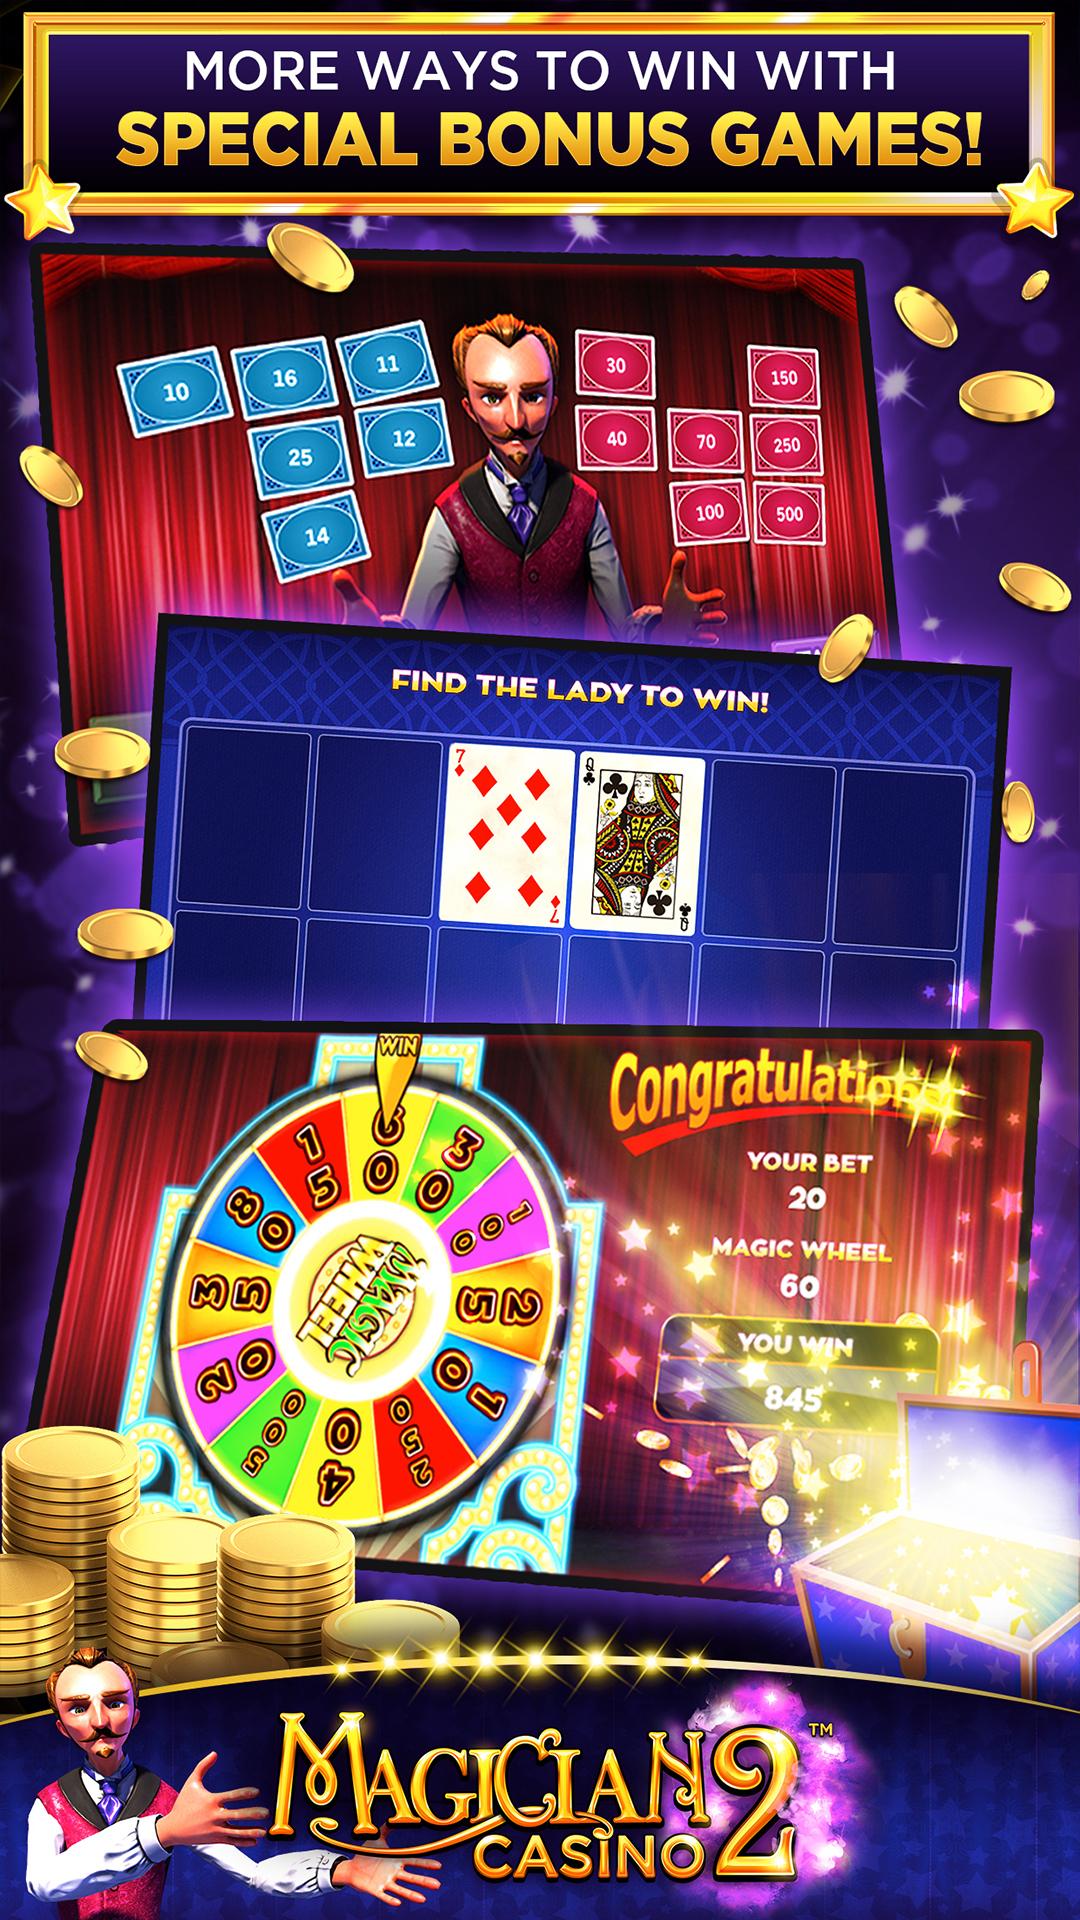 Casino resort in las vegas